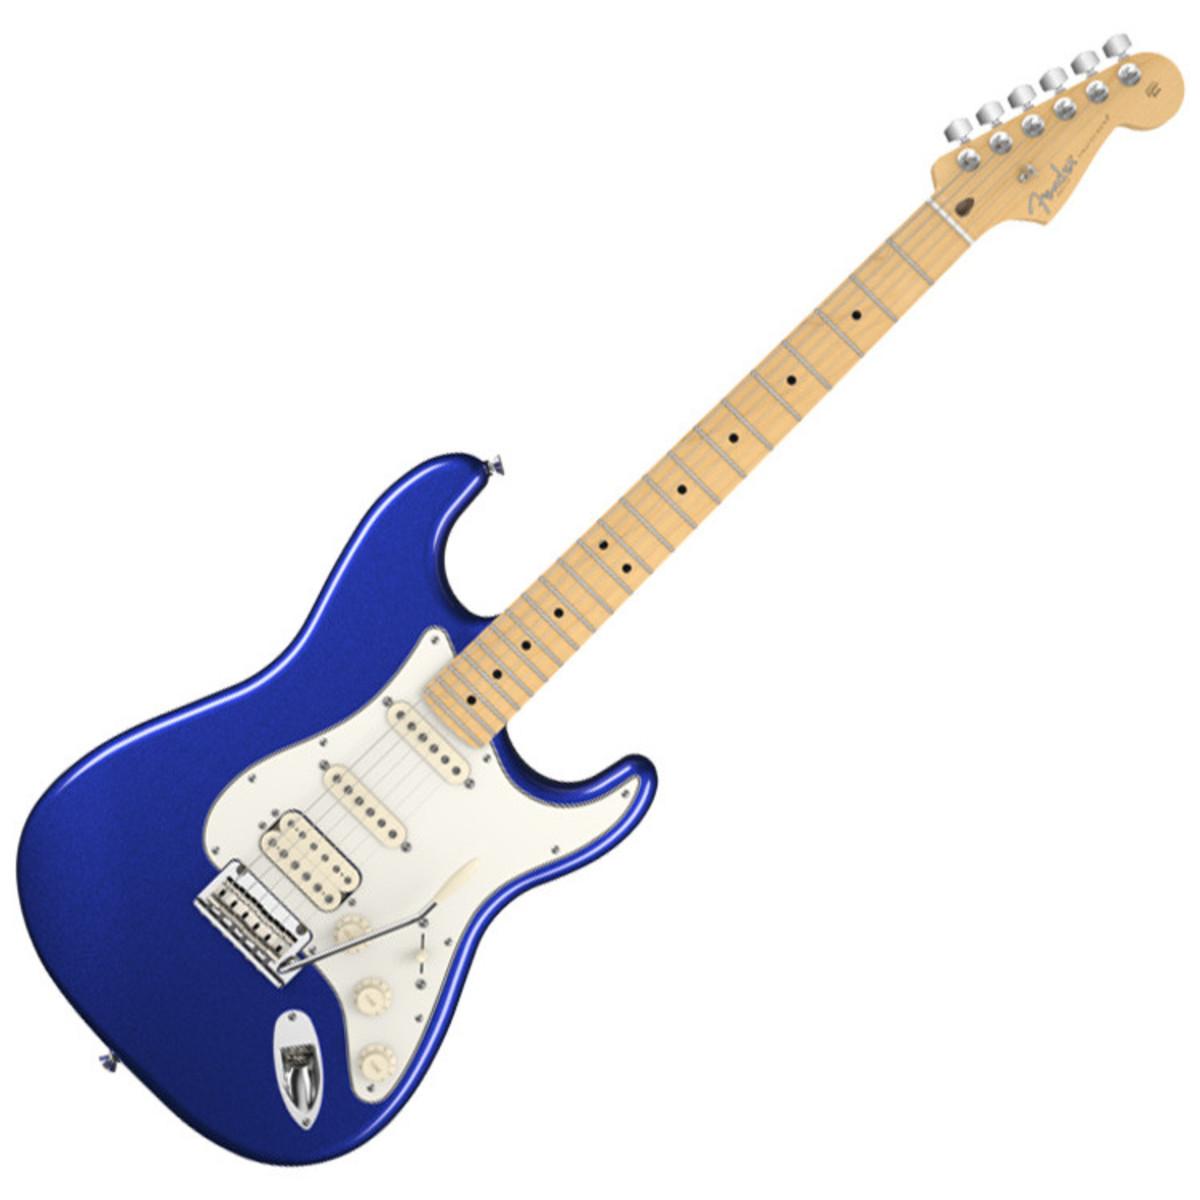 OFFLINE - Fender American Std Strat HSS Electric Guitar, Mystic Blue ...